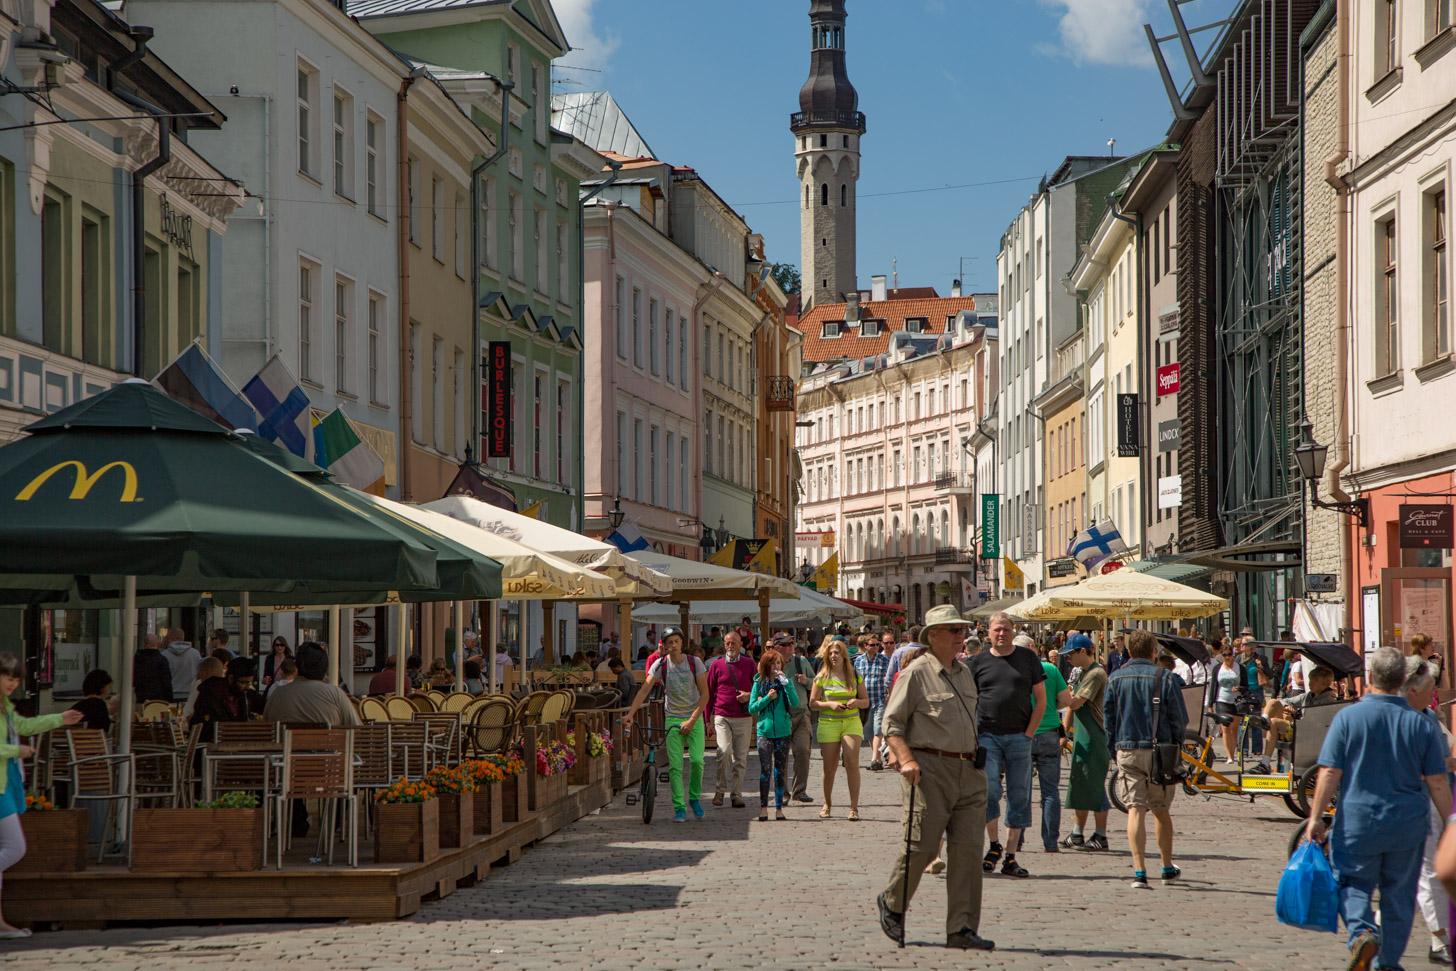 Gezellige drukte in de straten van Tallinn